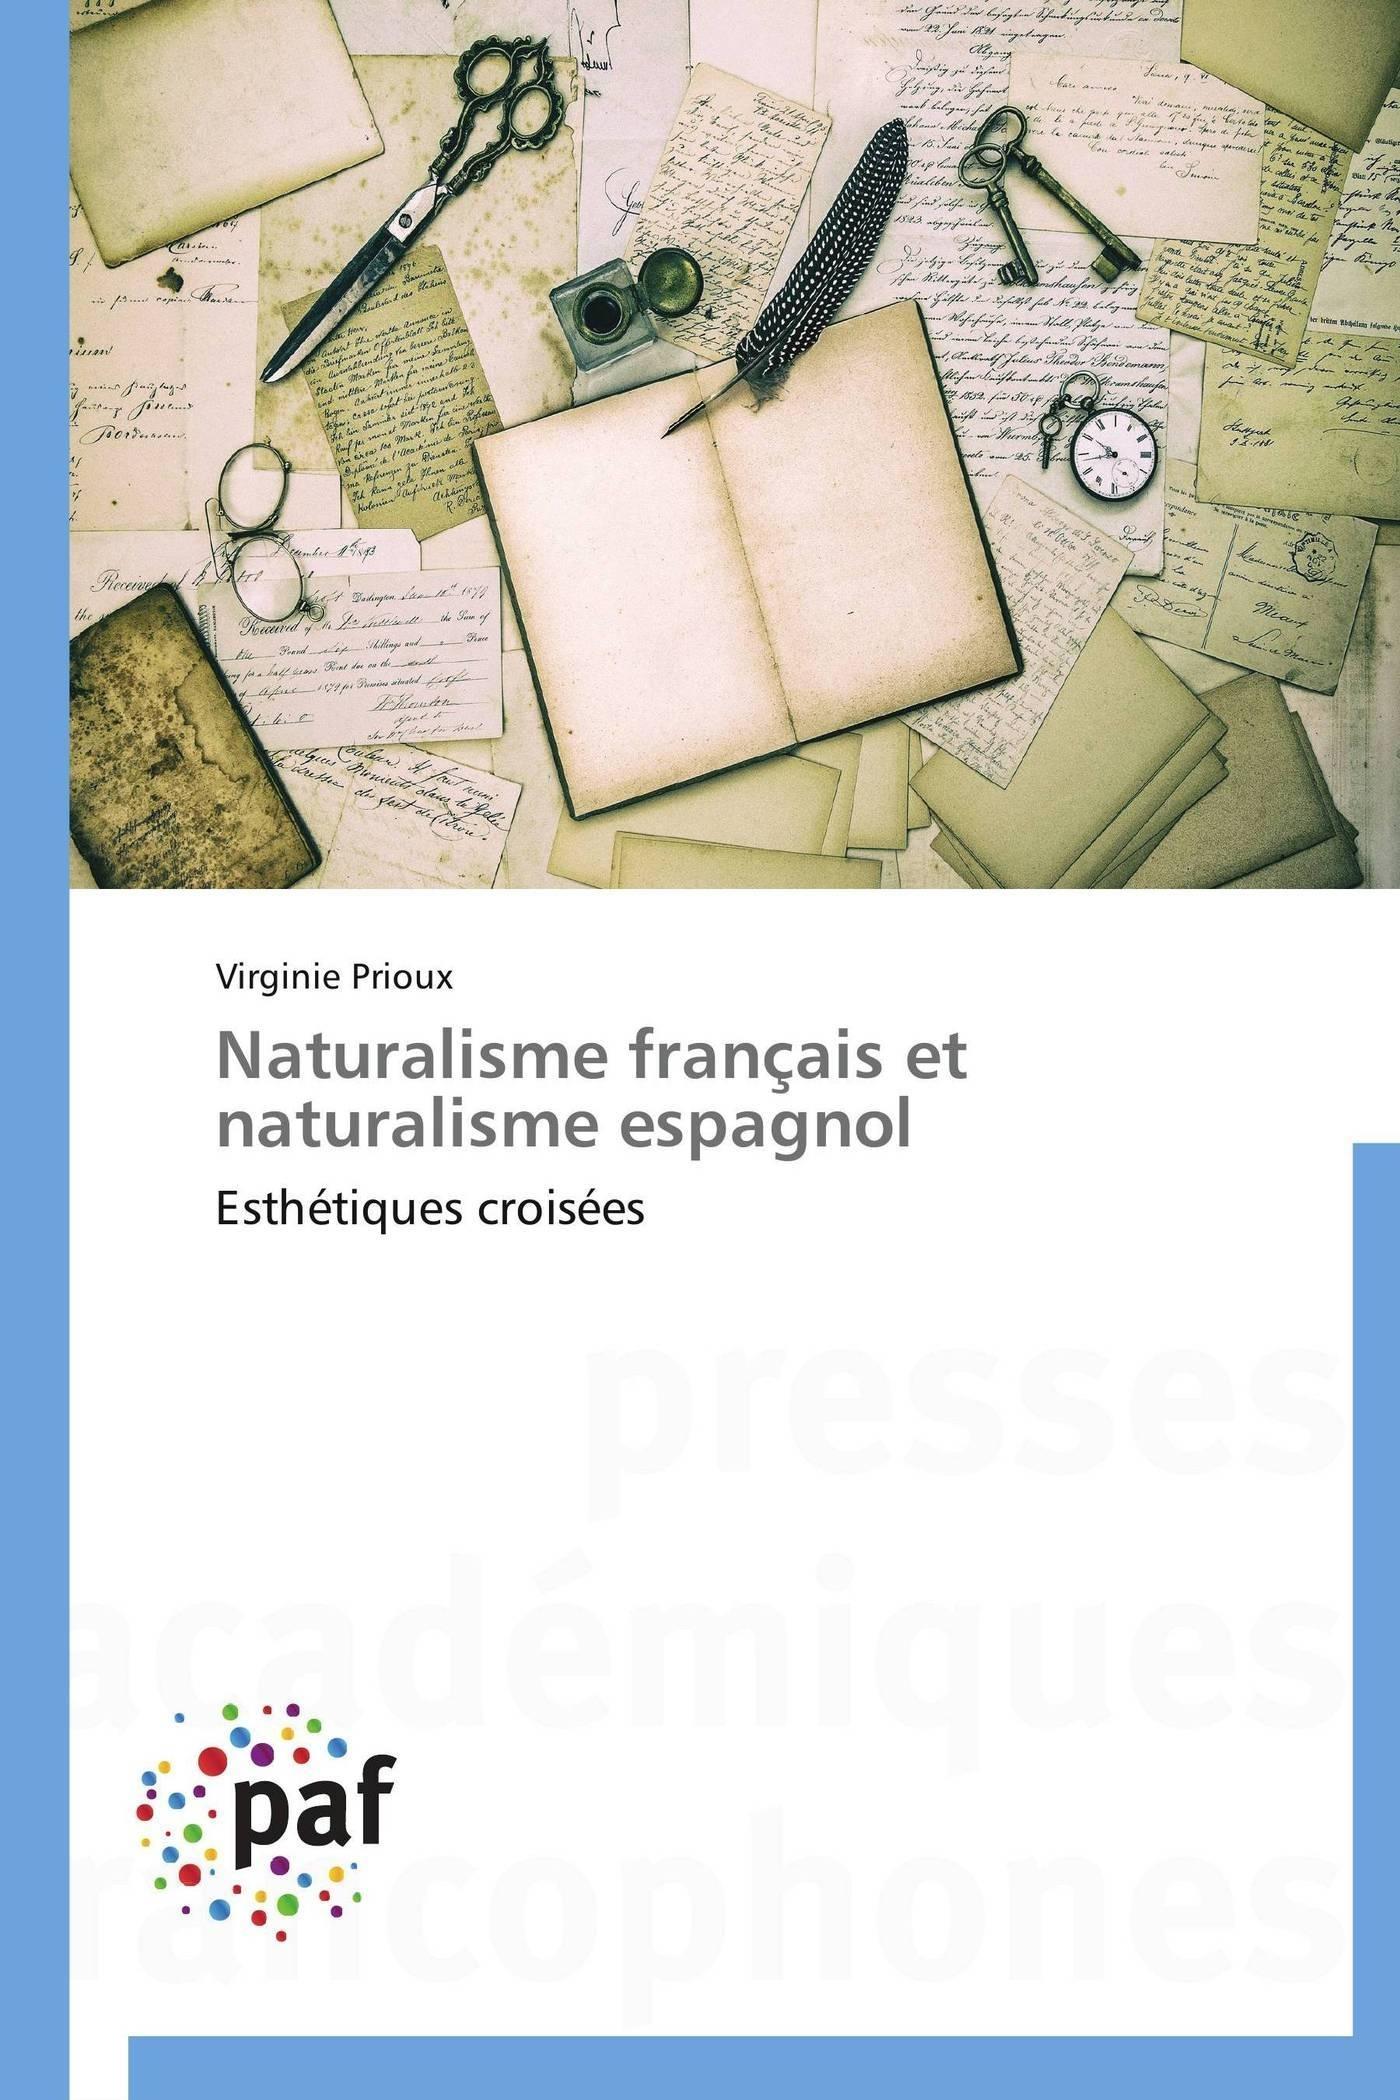 NATURALISME FRANCAIS ET NATURALISME ESPAGNOL